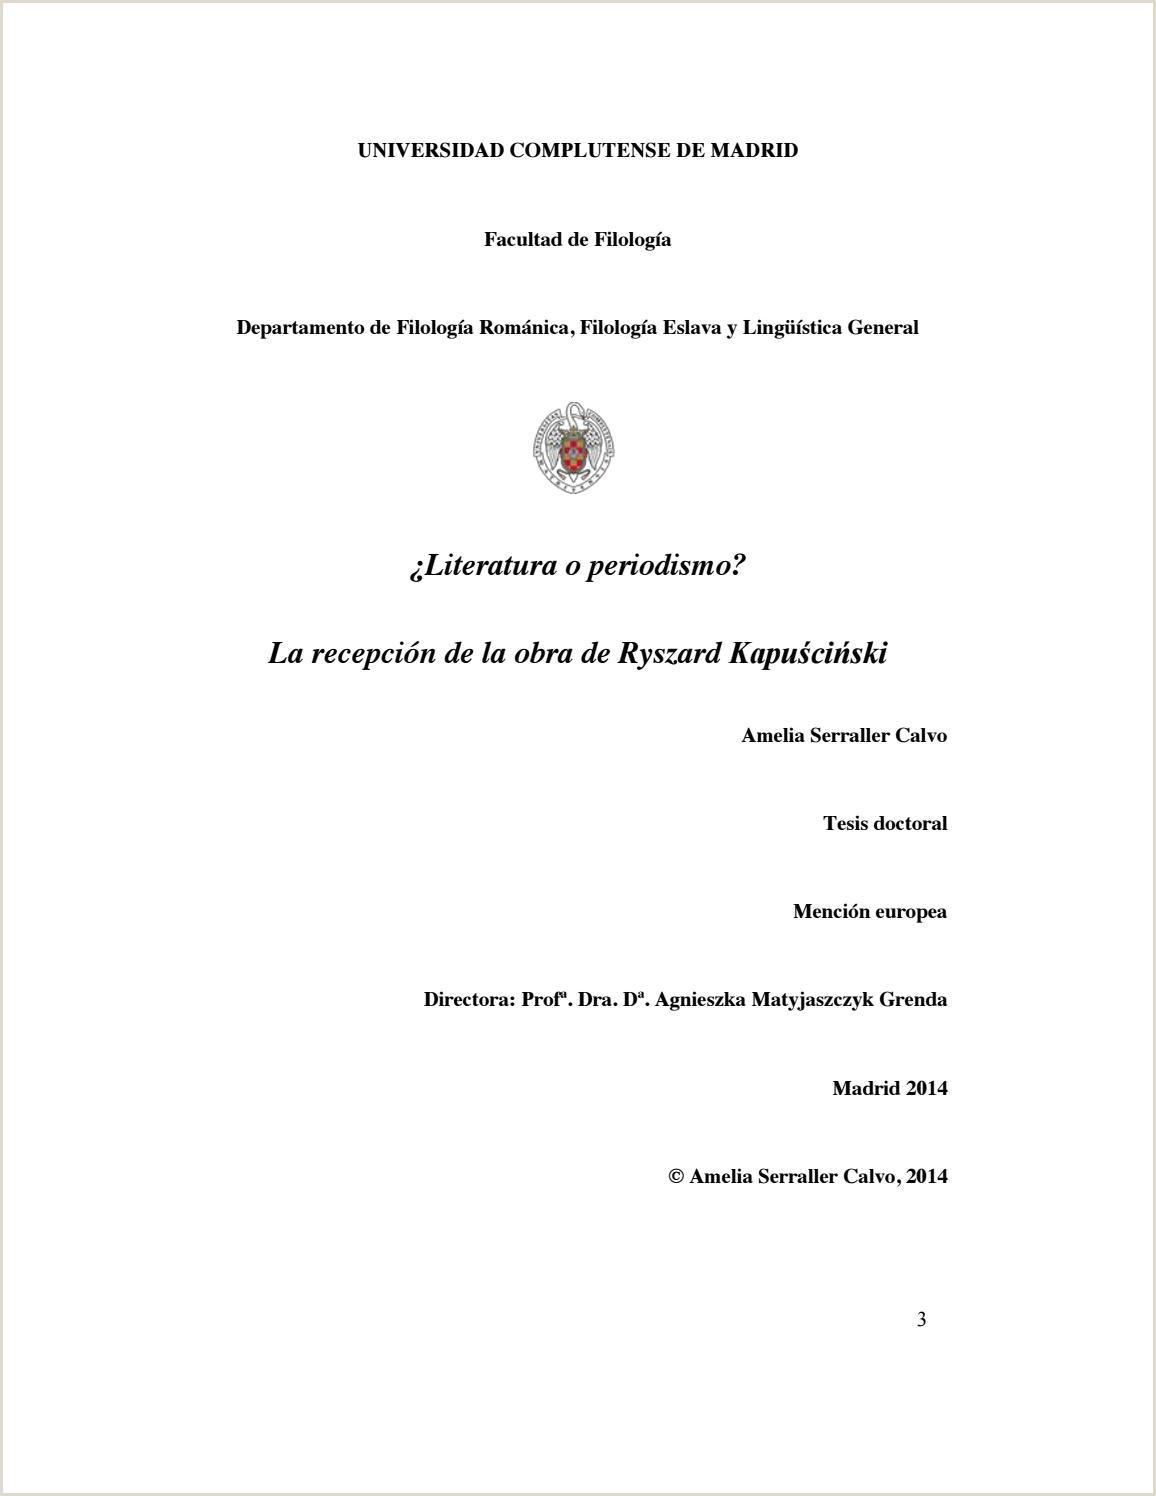 Formato Hoja De Vida Giz Literatura O Periodismo La Recepci³n De La Obra De Ryzard